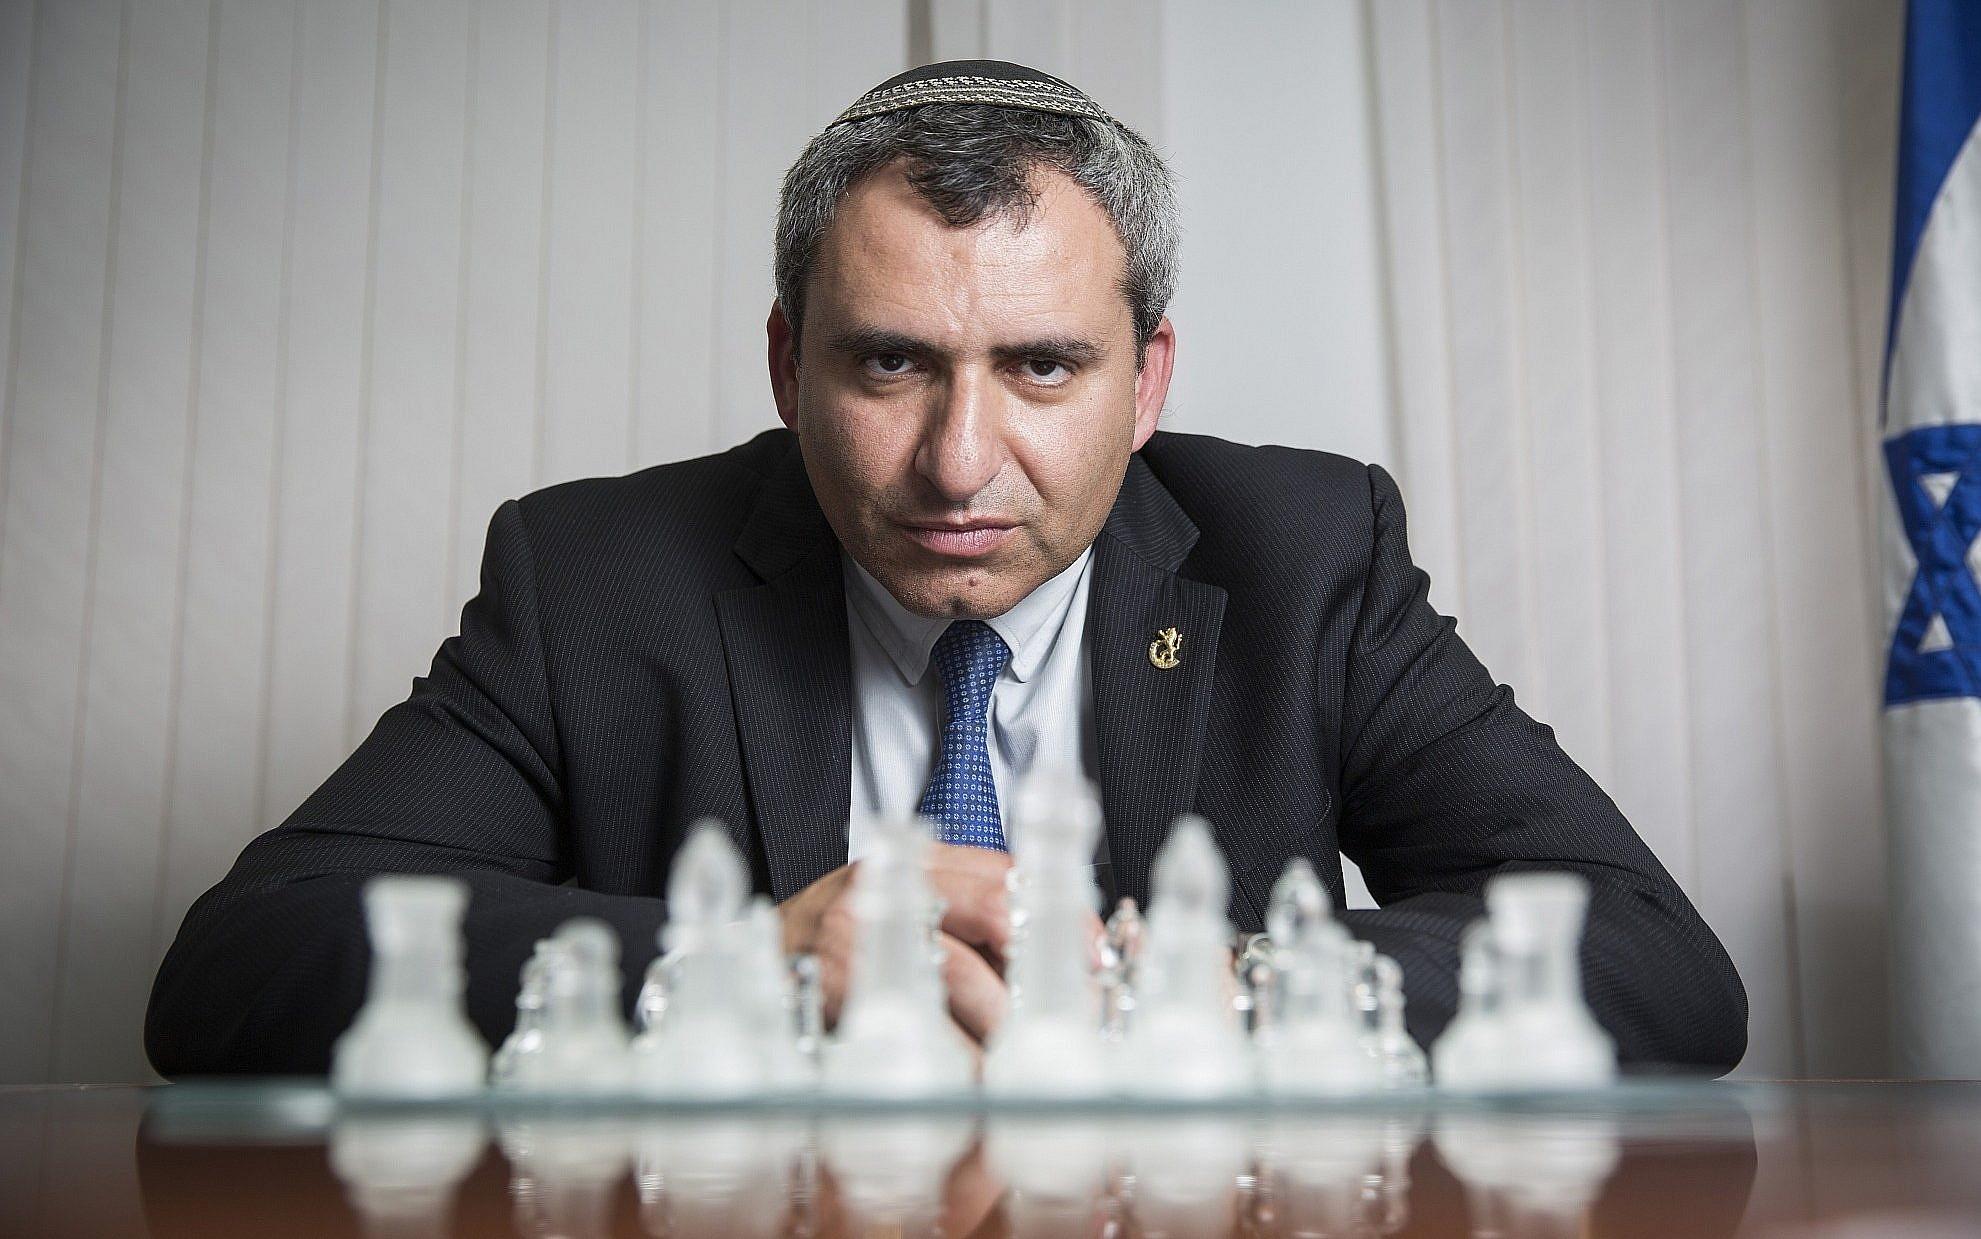 Ze'ev Elkin in his office on May 2, 2016. (Hadas Parush/Flash90)